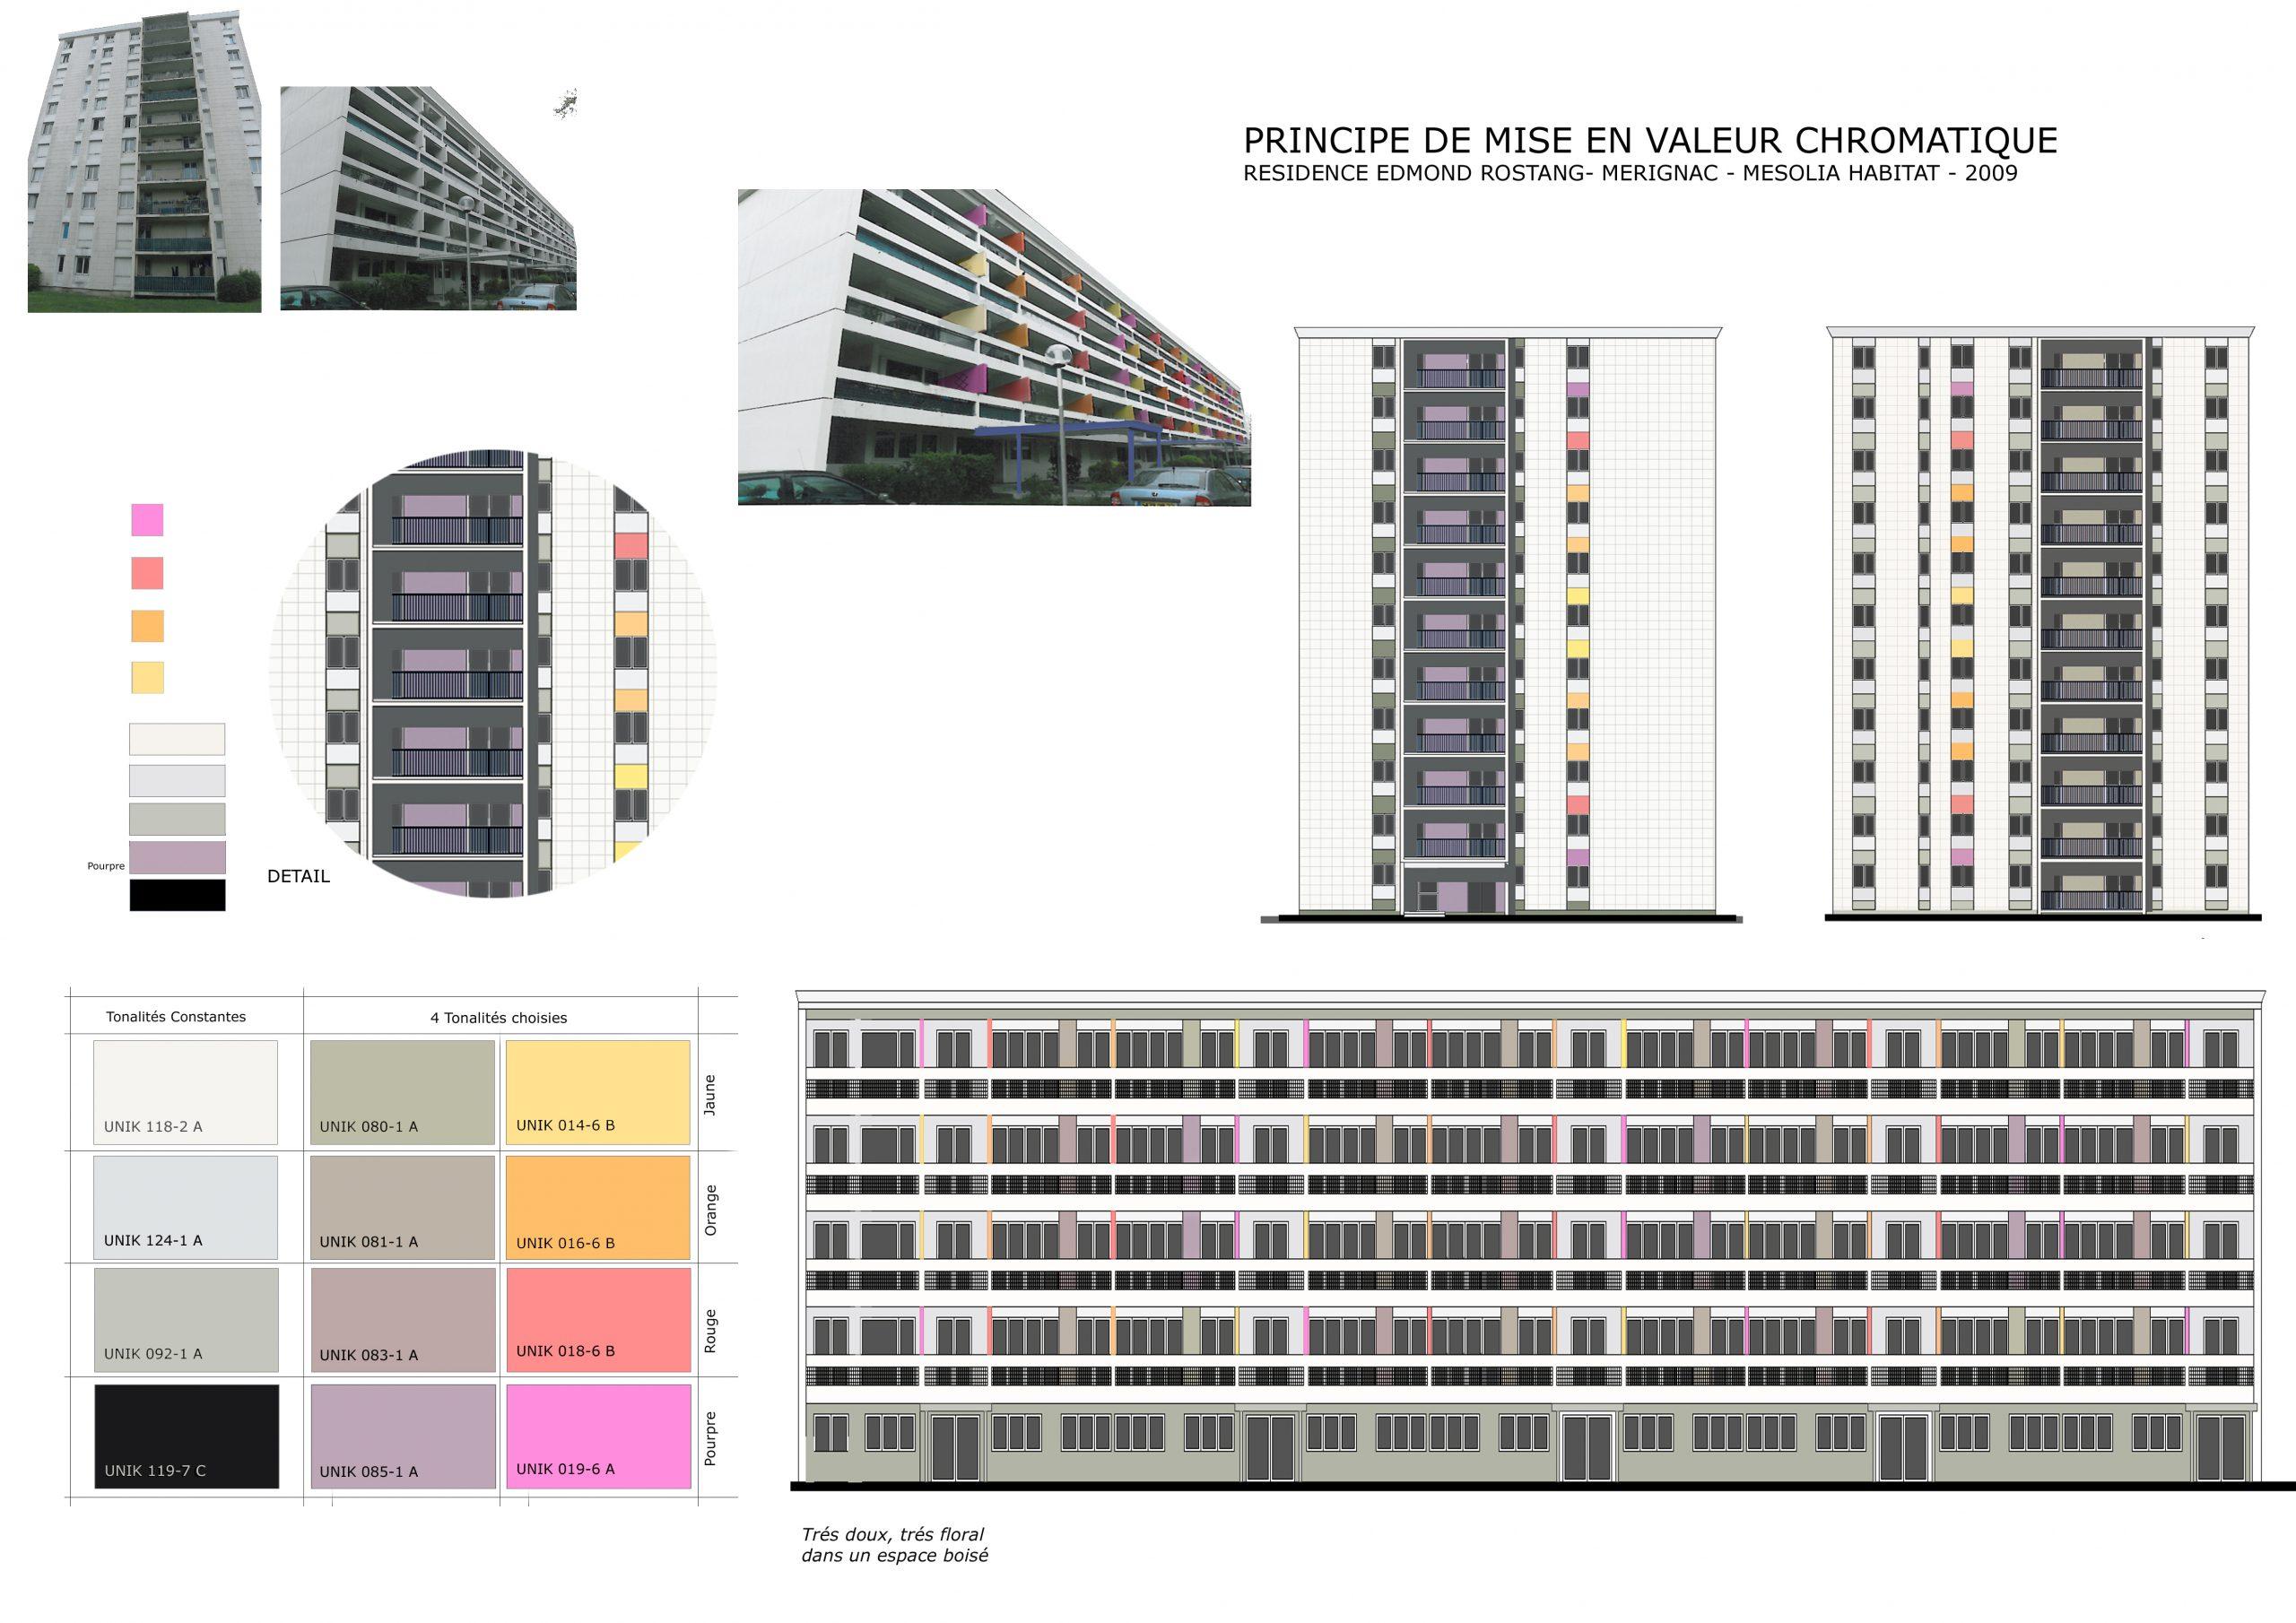 Polychromie-Requalification chromatique des façades-Mérignac